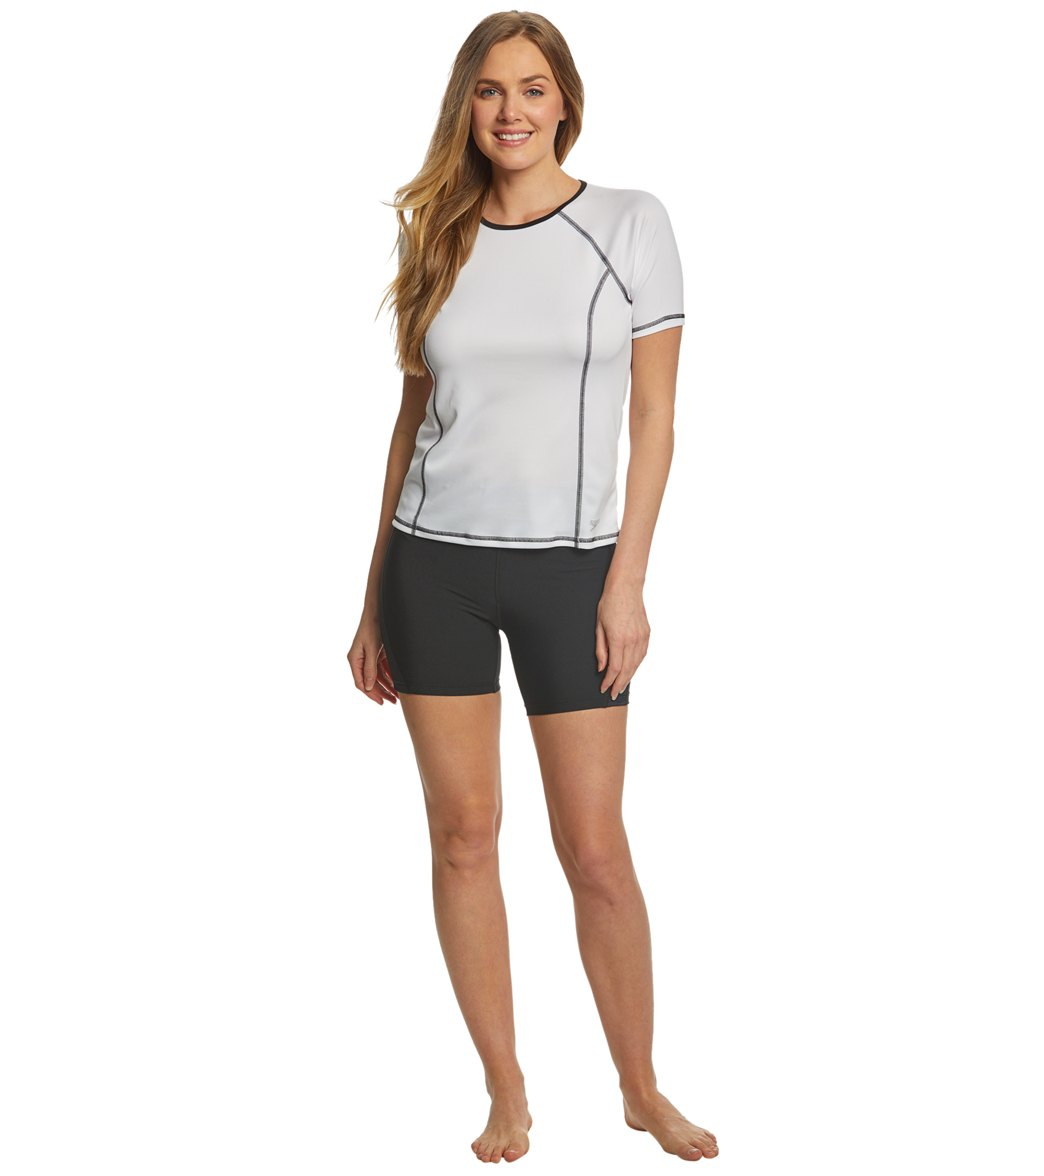 a2116d20e70 Speedo Women's Short Sleeve Swim Tee. Speedo Black; White